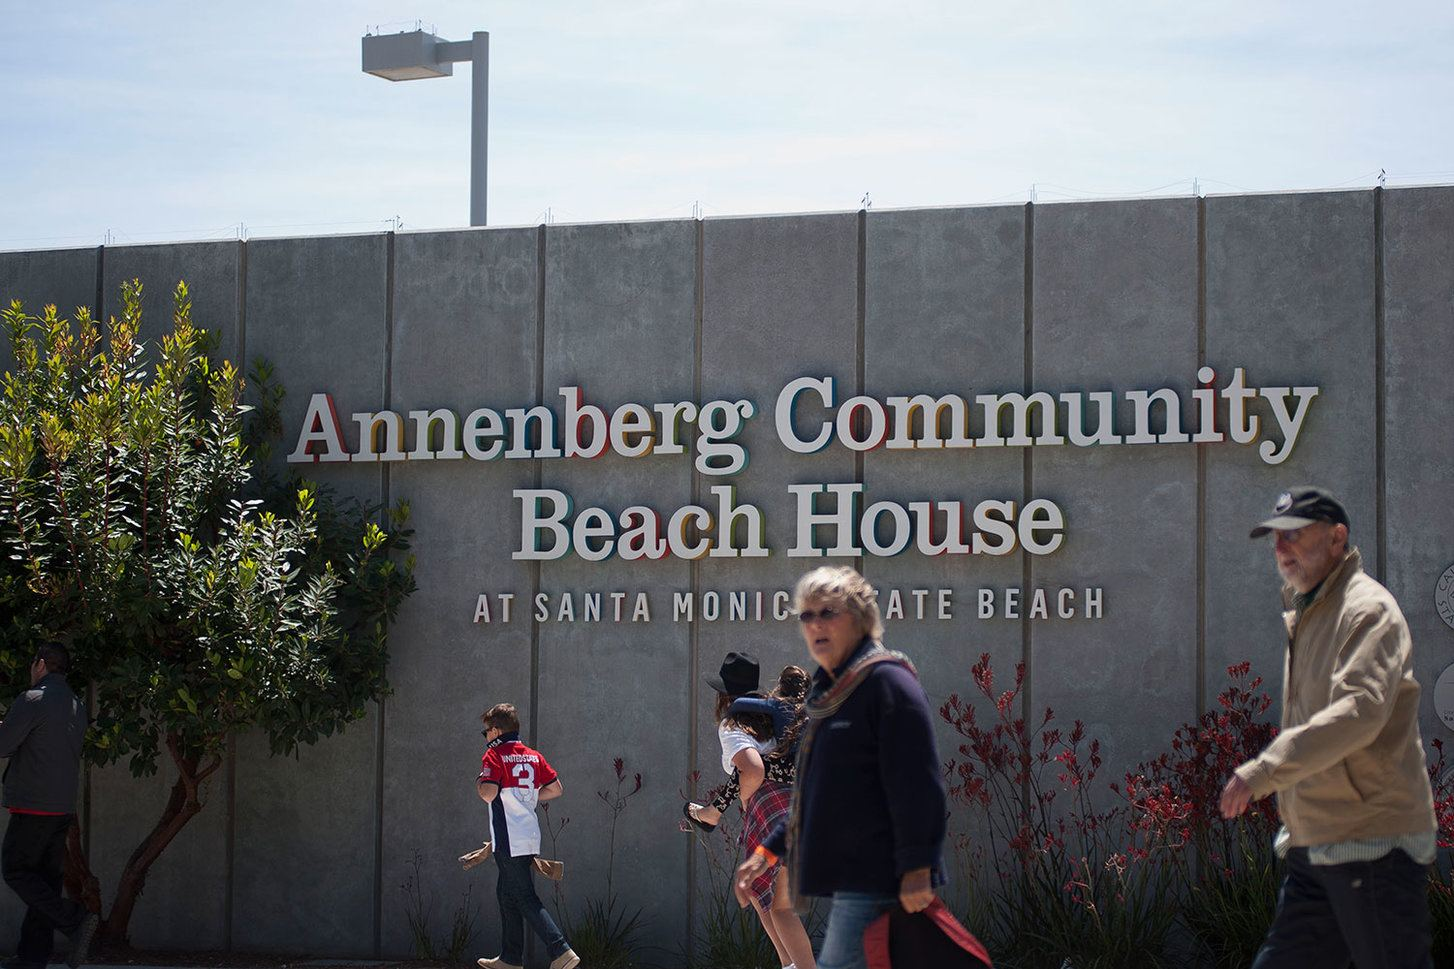 Annenberg Community Beach House